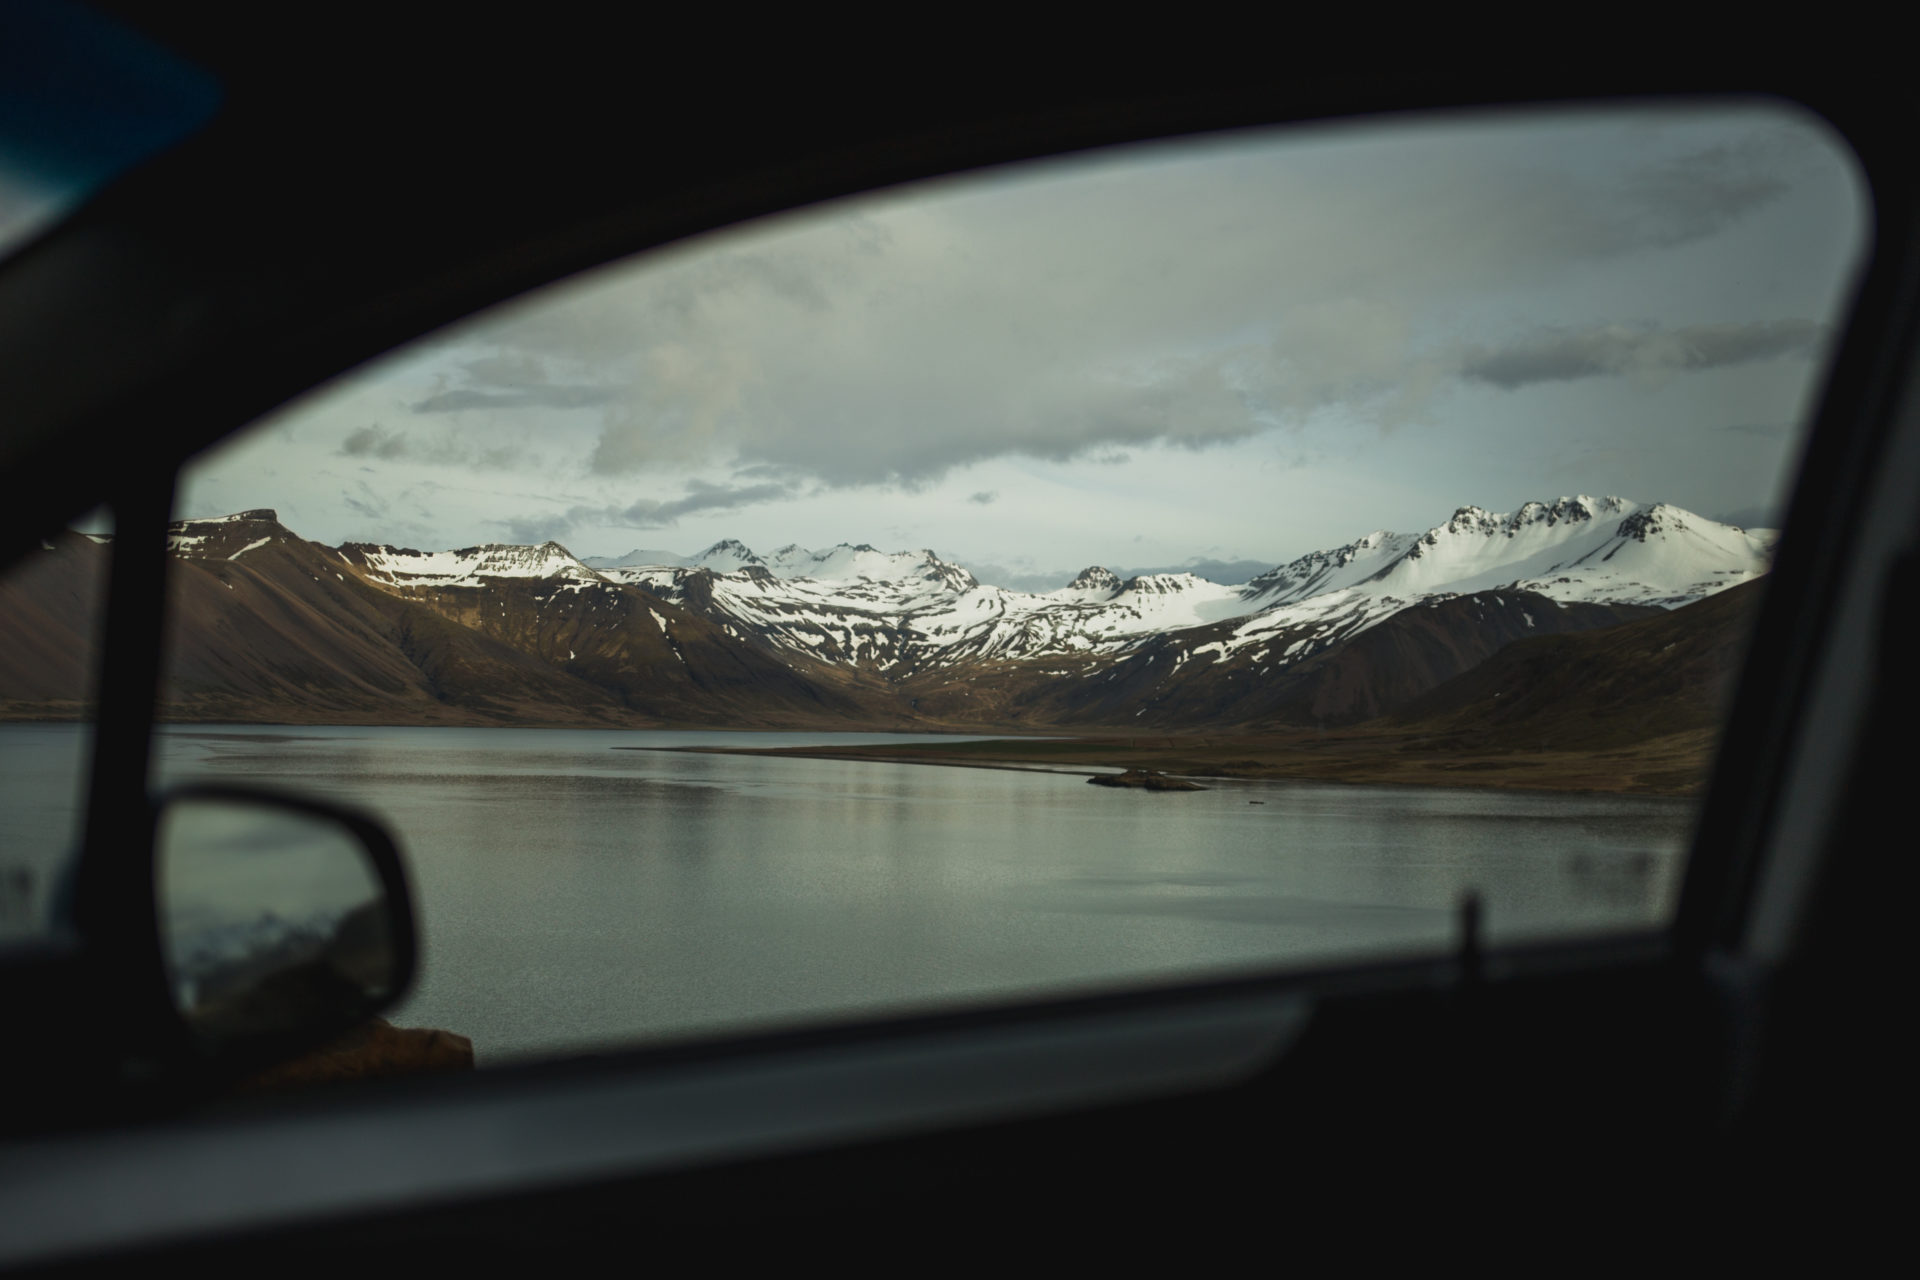 Island_Iceland_IMG_2705_Carolin-Weinkopf